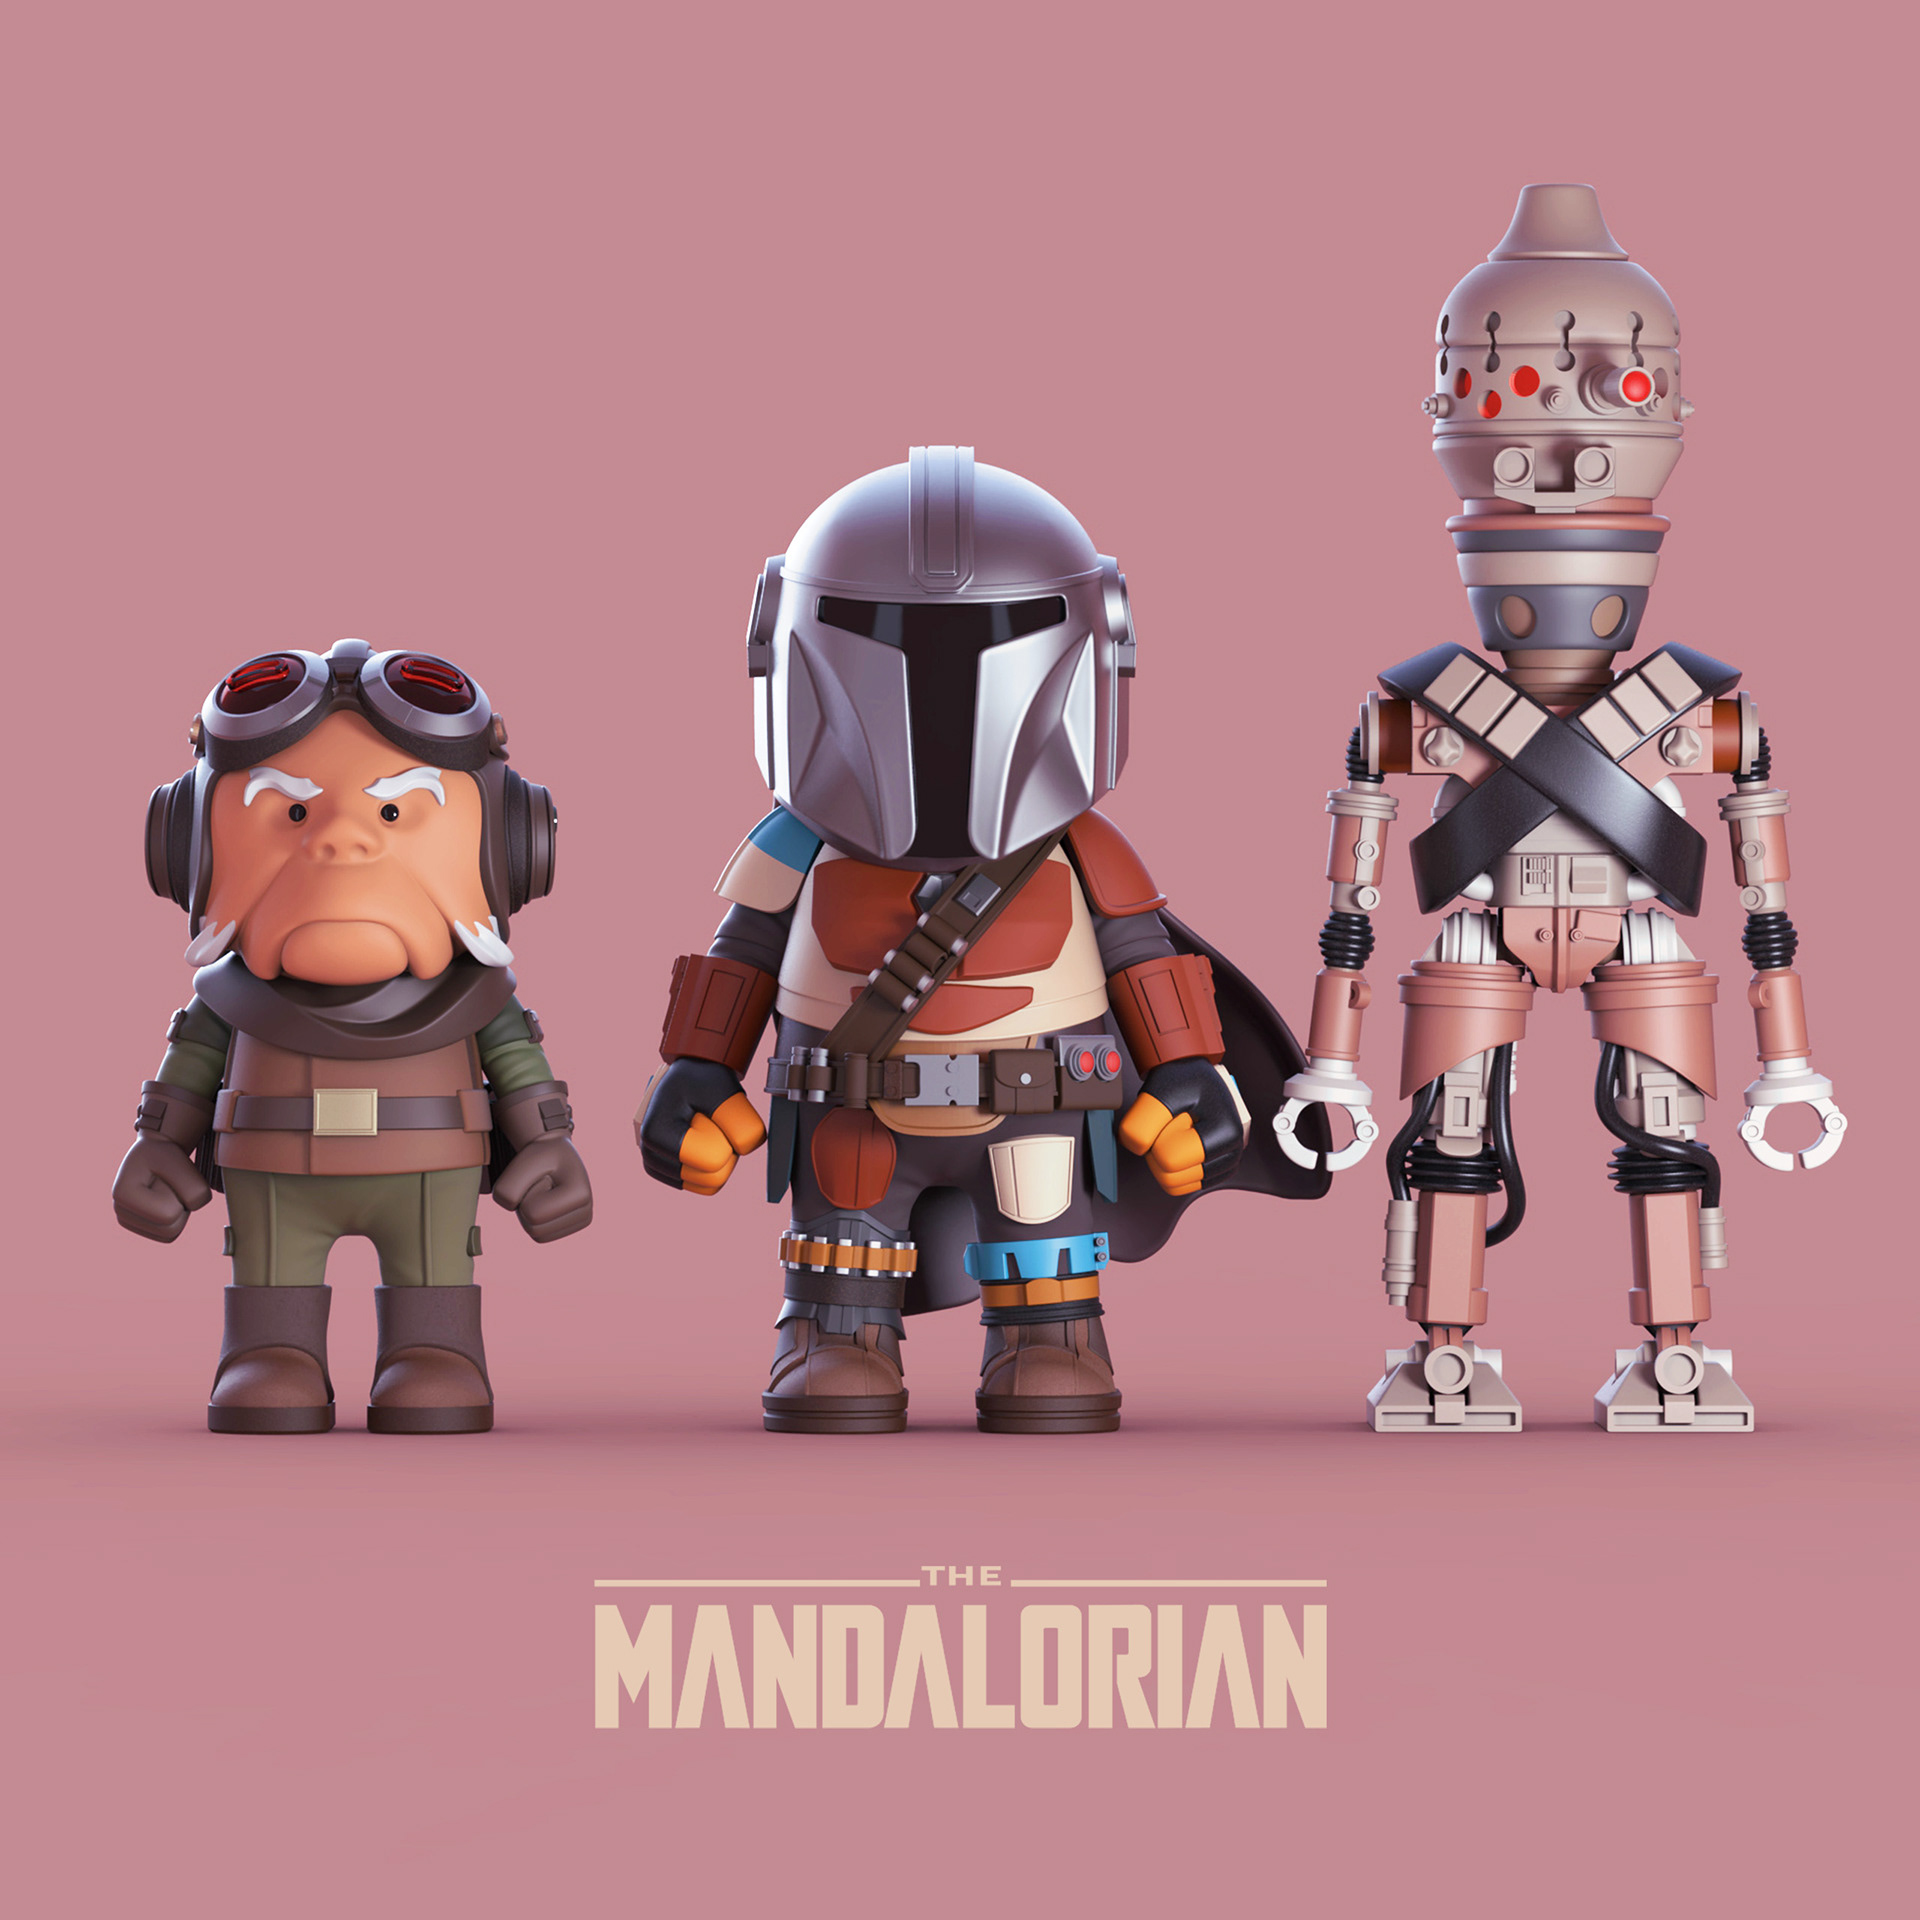 Toy Design,Digital Art,Character Design